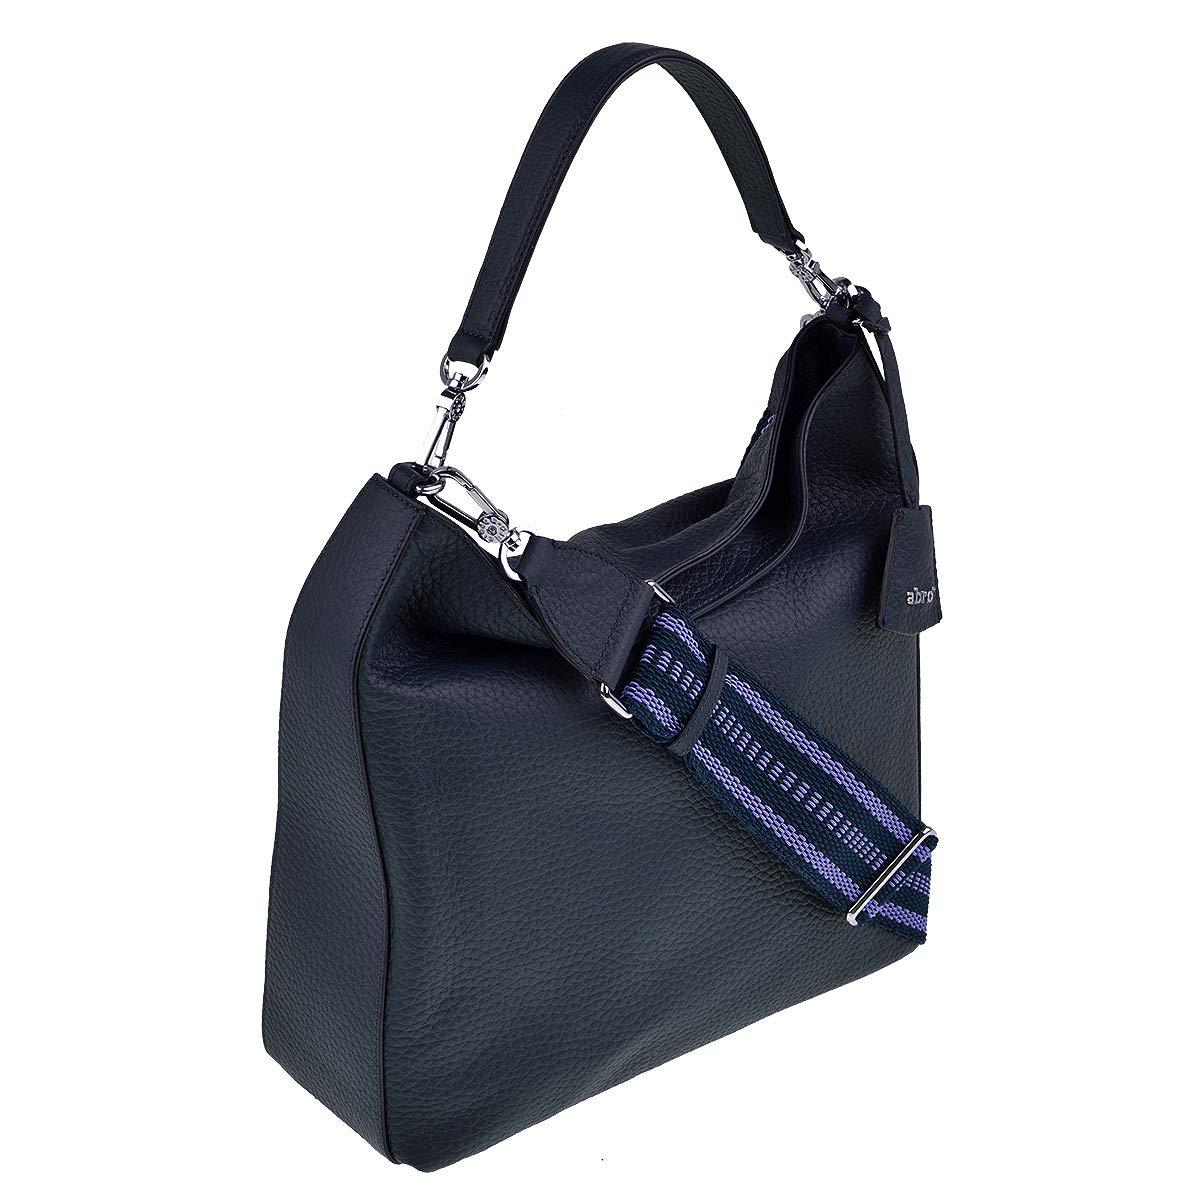 1b31542e653ab Abro BEUTELTASCHE CERVO Blau One Size  Amazon.de  Schuhe   Handtaschen